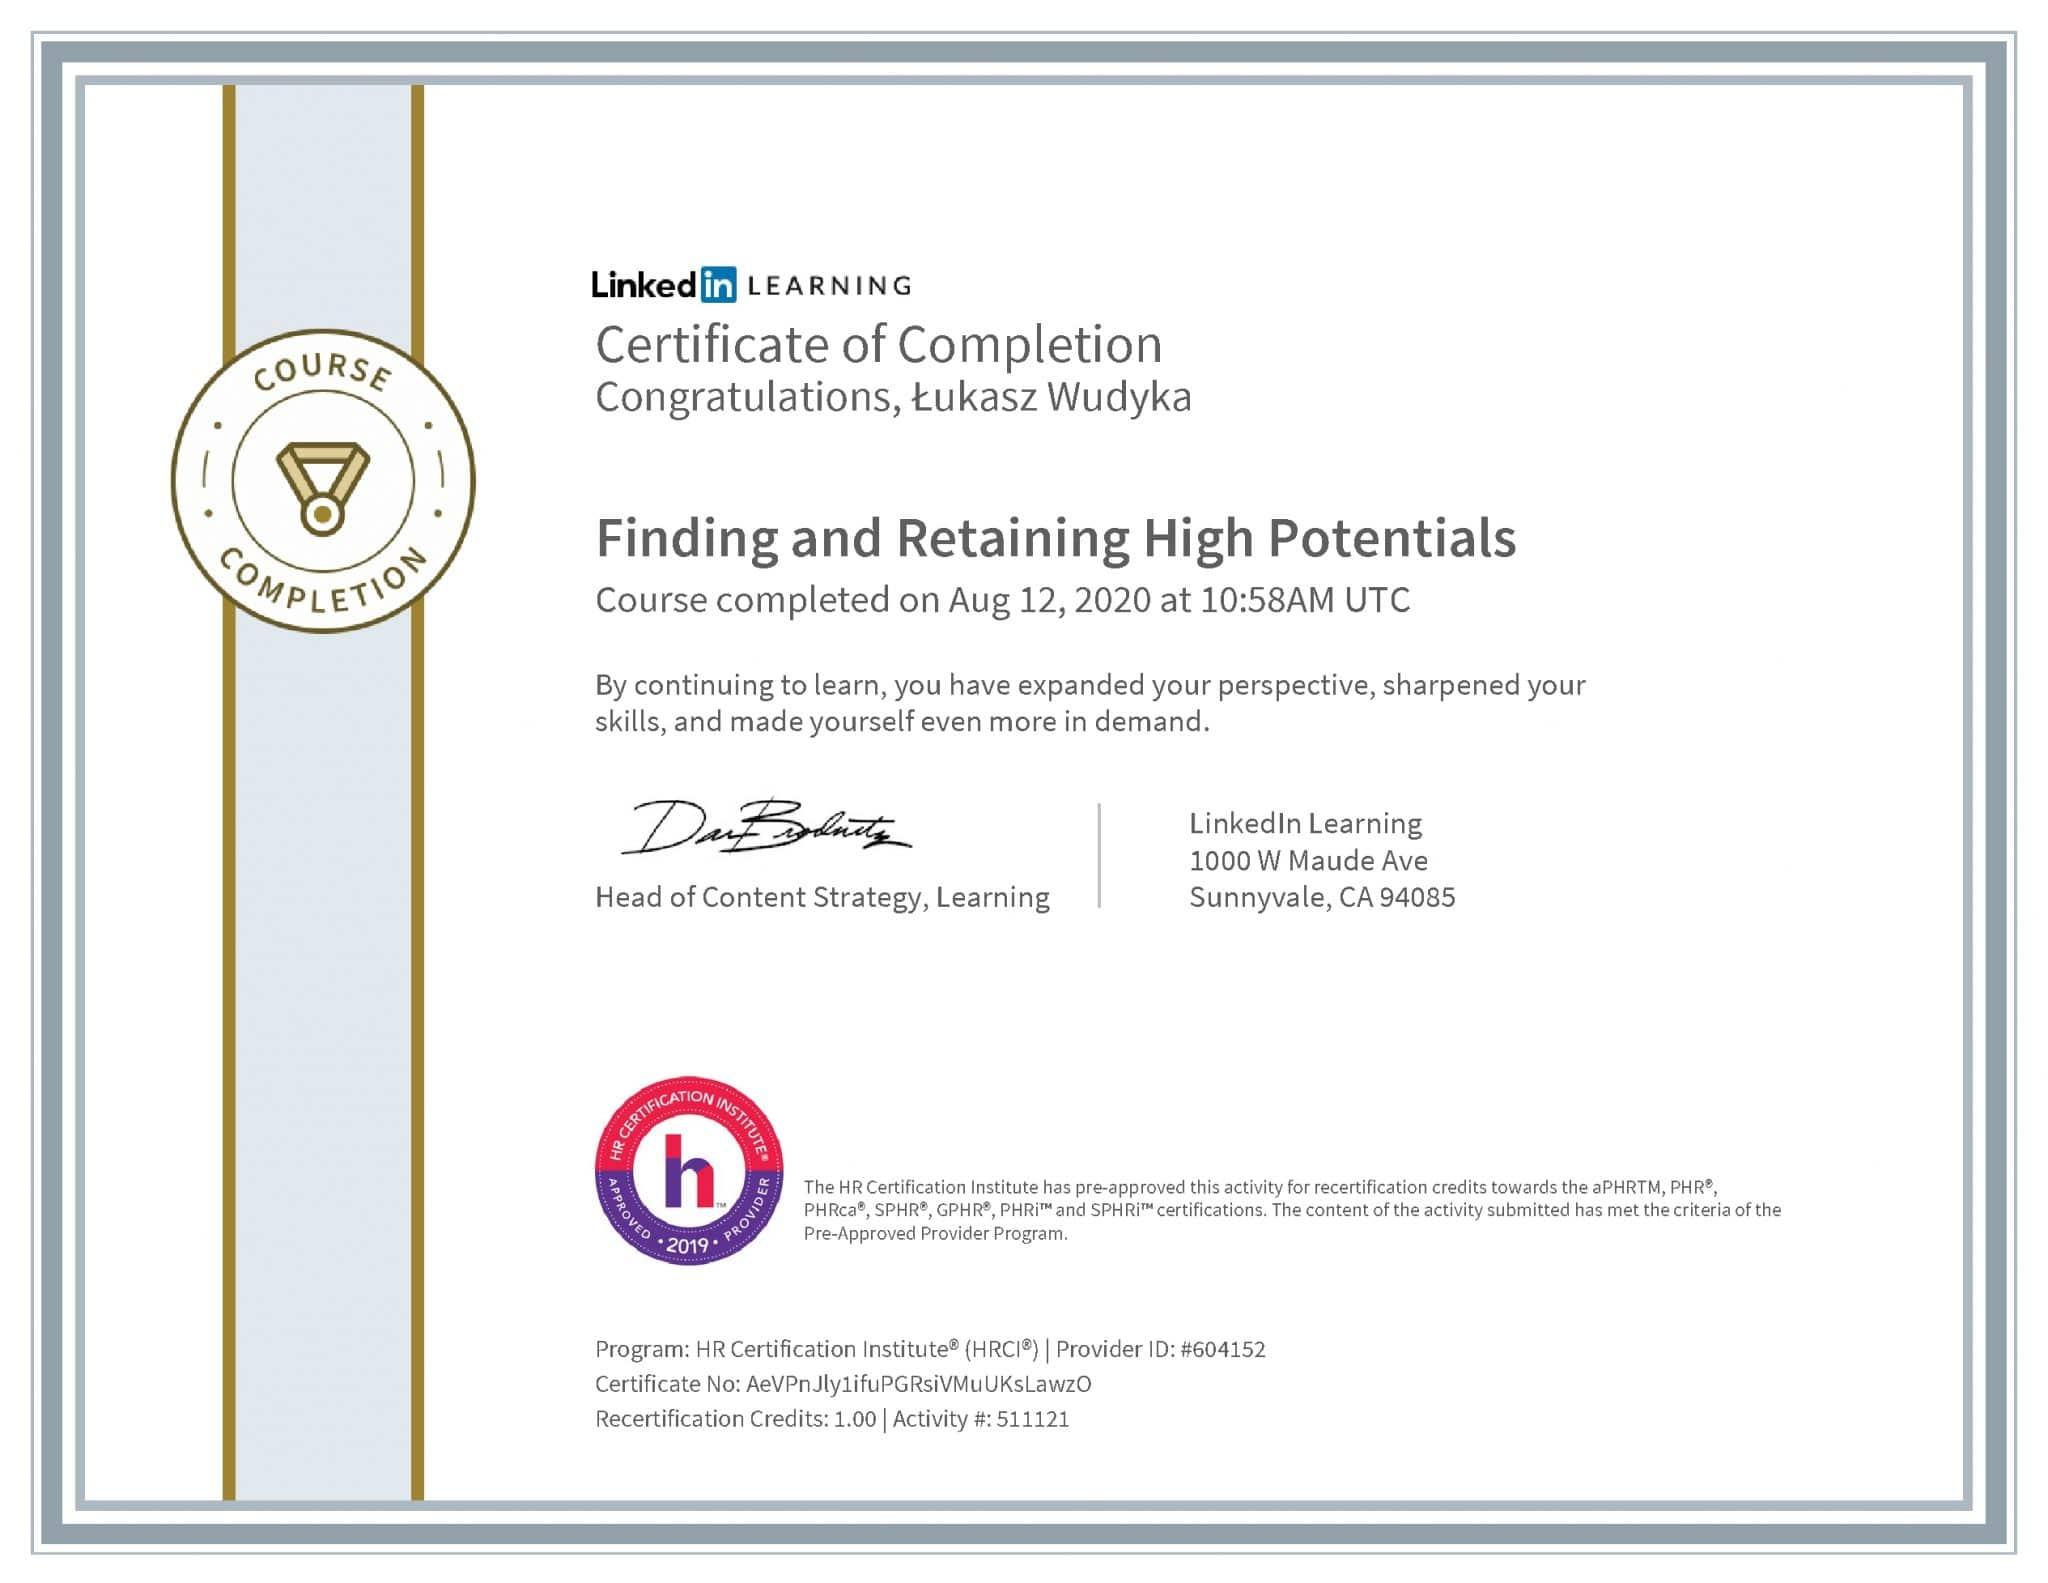 Łukasz Wudyka certyfikat LinkedIn Finding and Retaining High Potentials HRCI